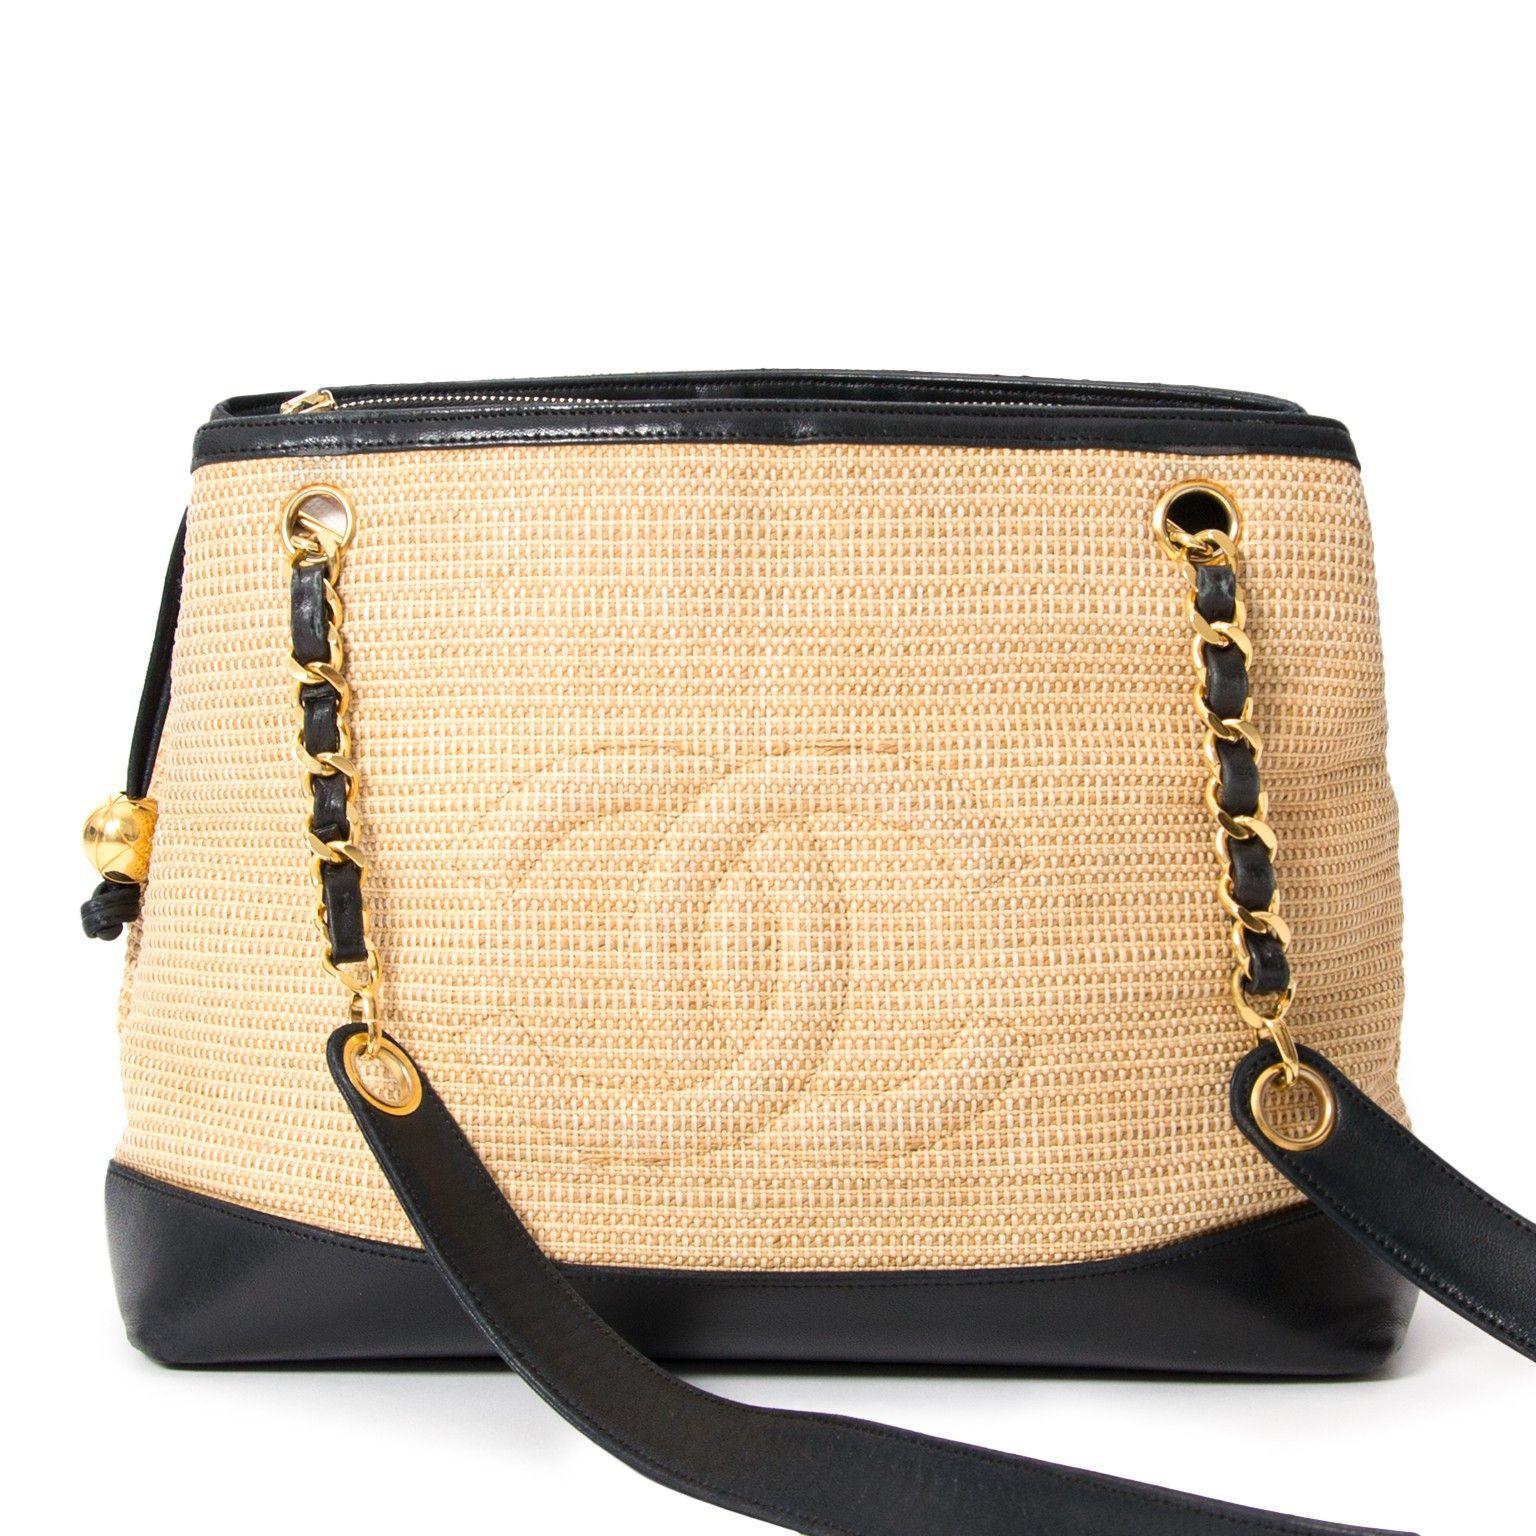 86c283d76c03 Chanel Woven Raffia Shoulderbag webshop LabelLOV designer bags vintage